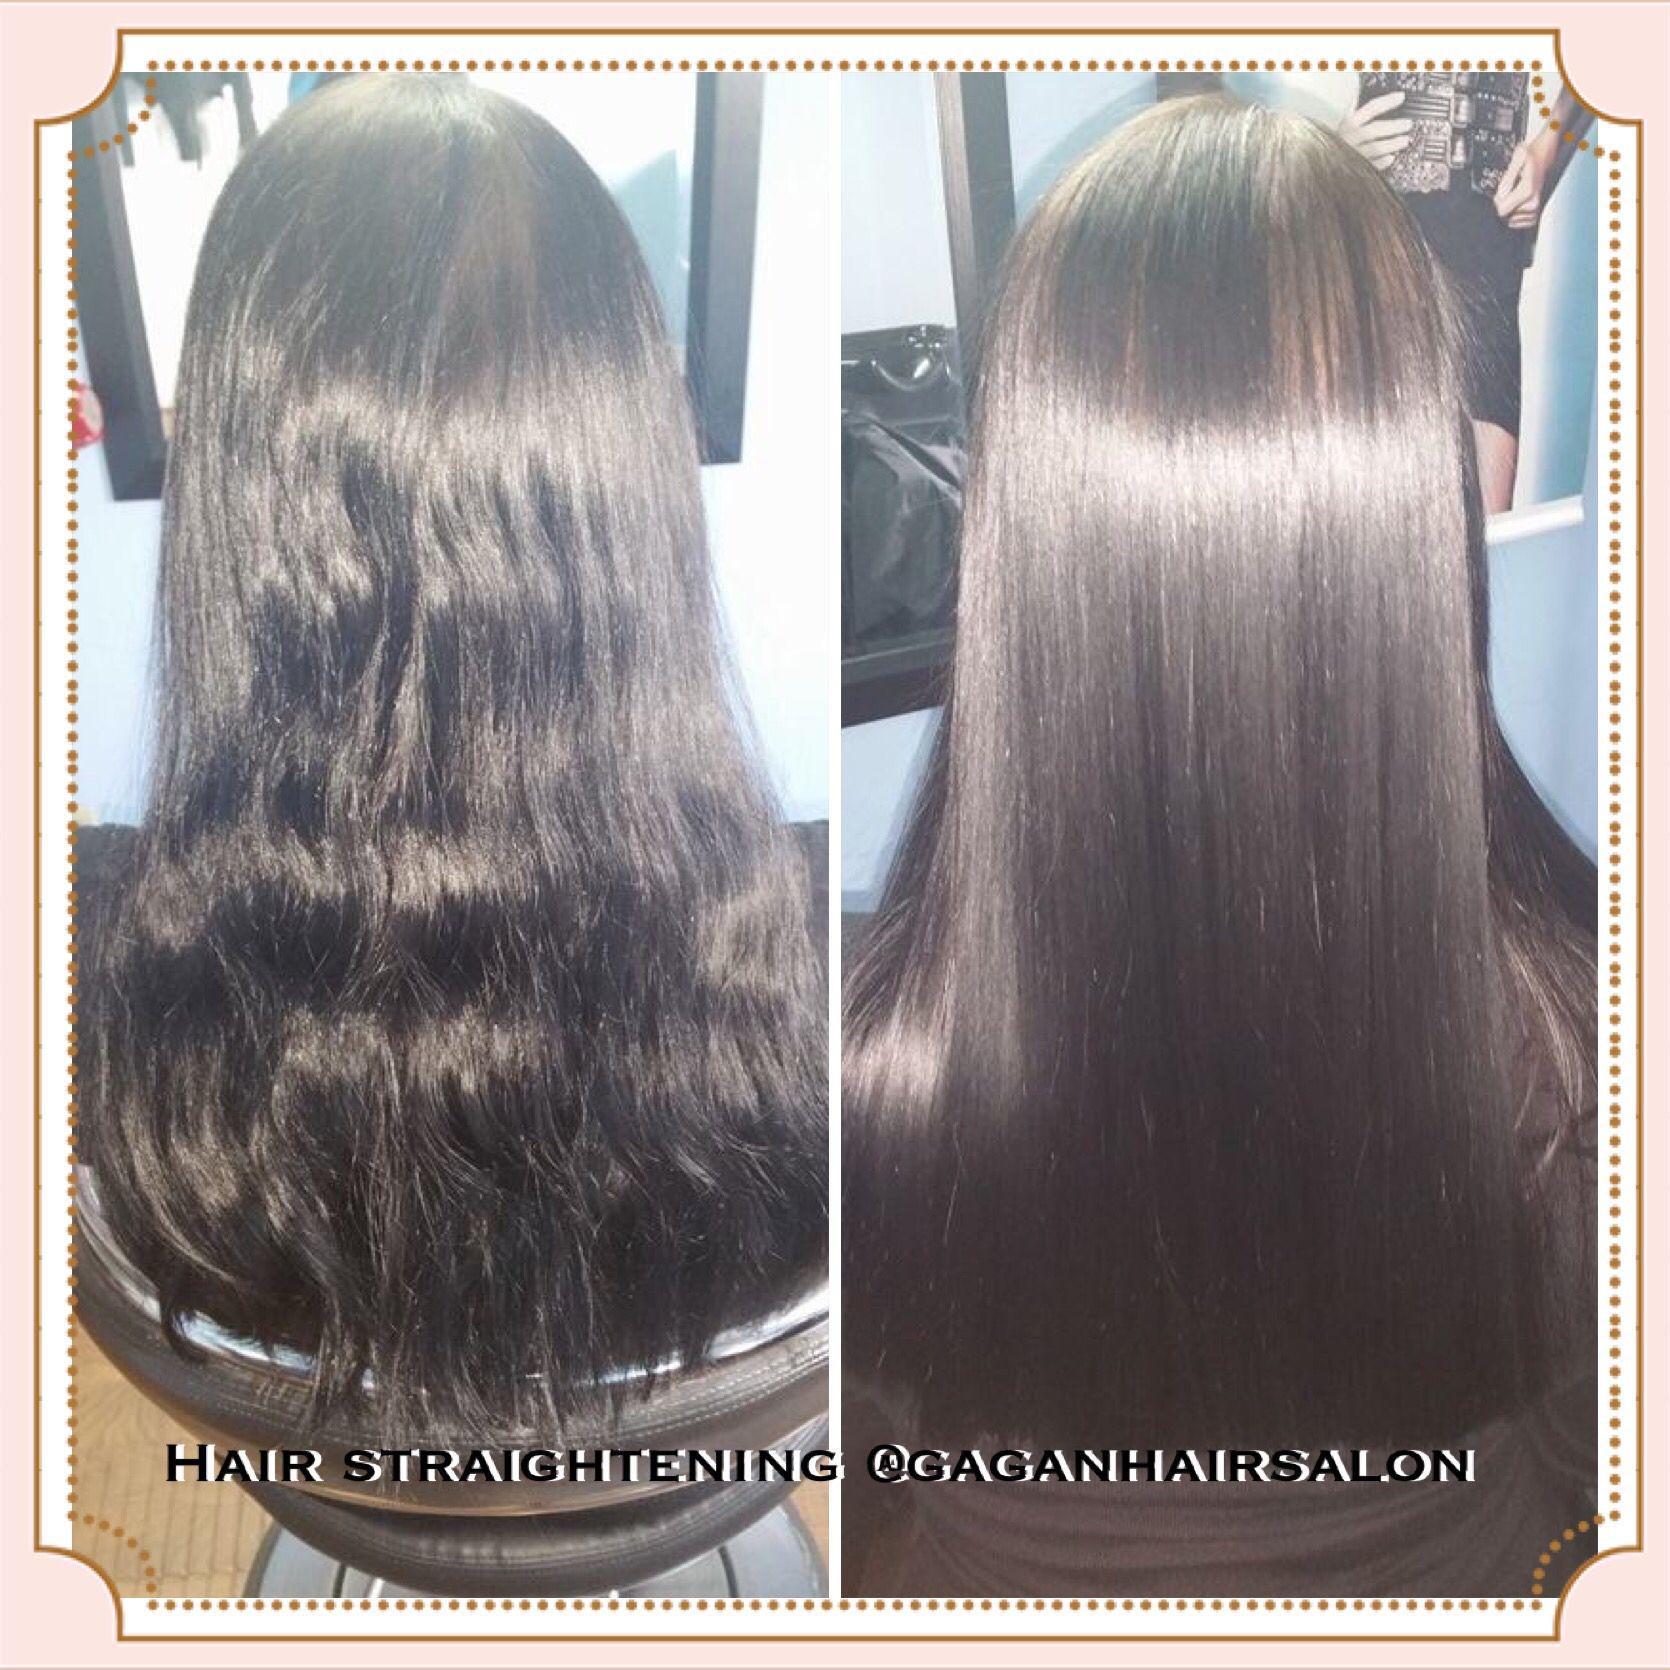 Pin By Imani Tolber On Hairgoals Pinterest Hair Straightening